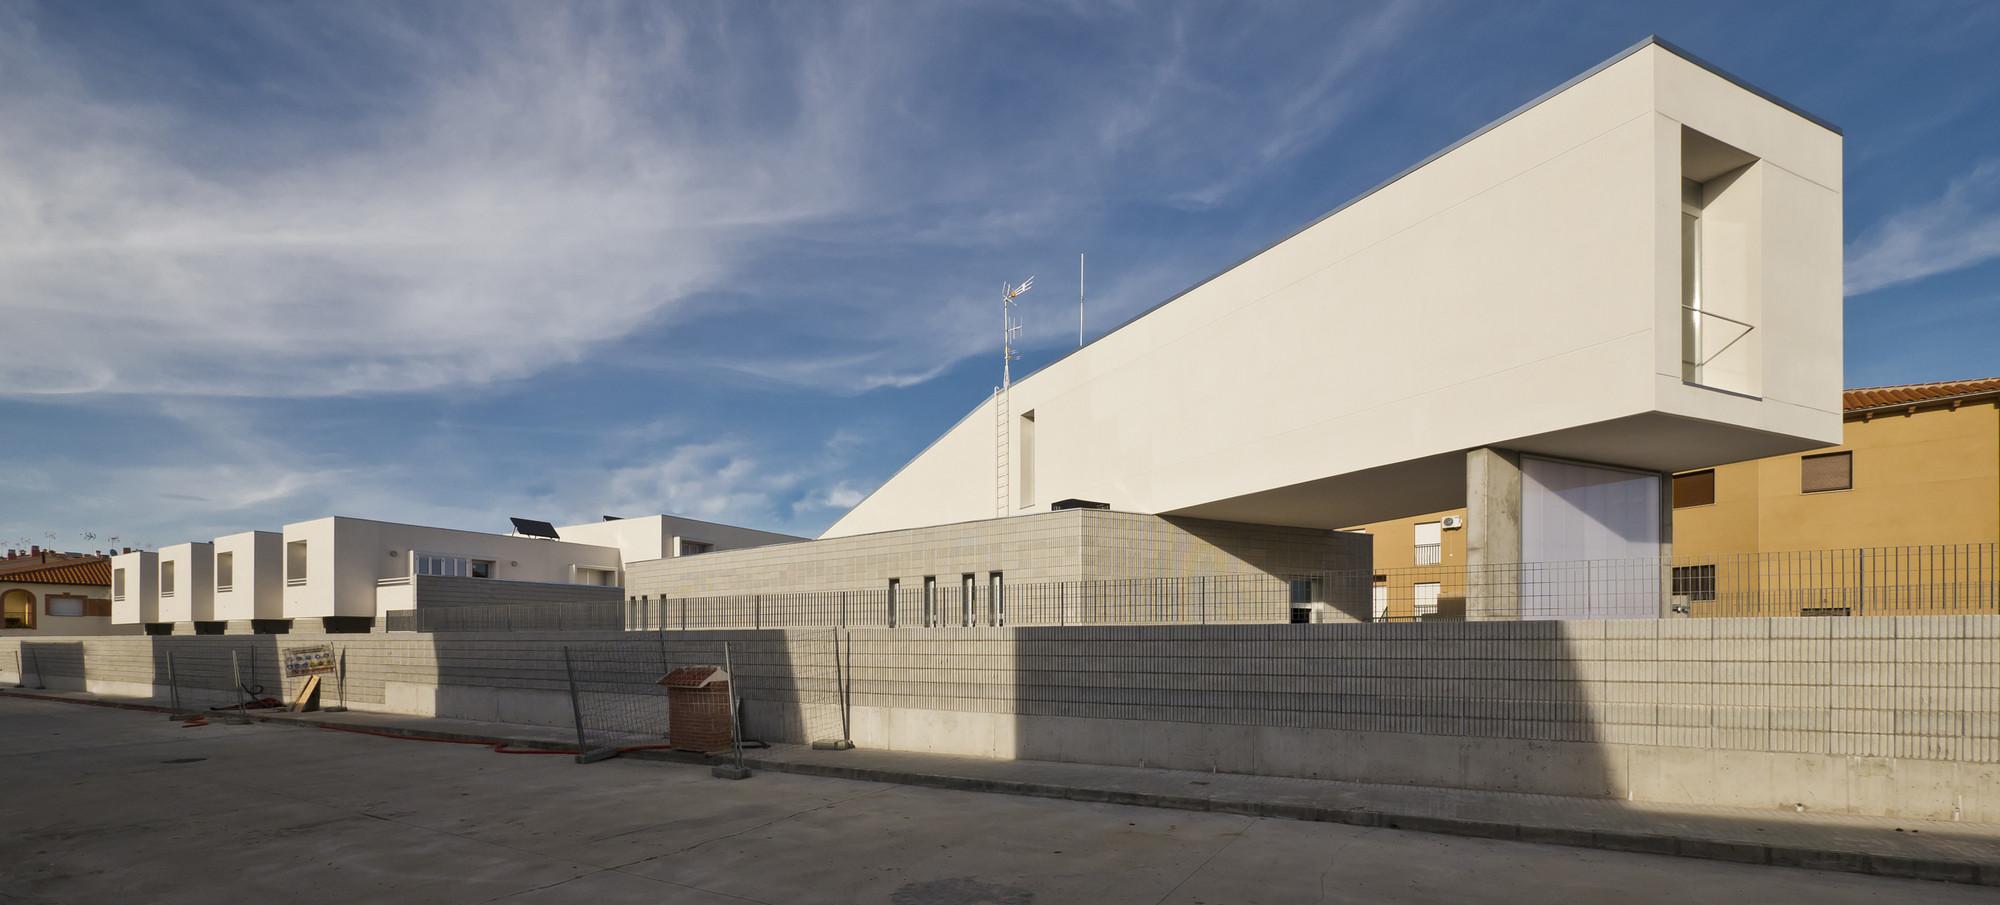 Casa Cuartel Guardia Civil de Malpartida de Plasencia / MUDAARQUITECTURA, © Juan Carlos Quindós